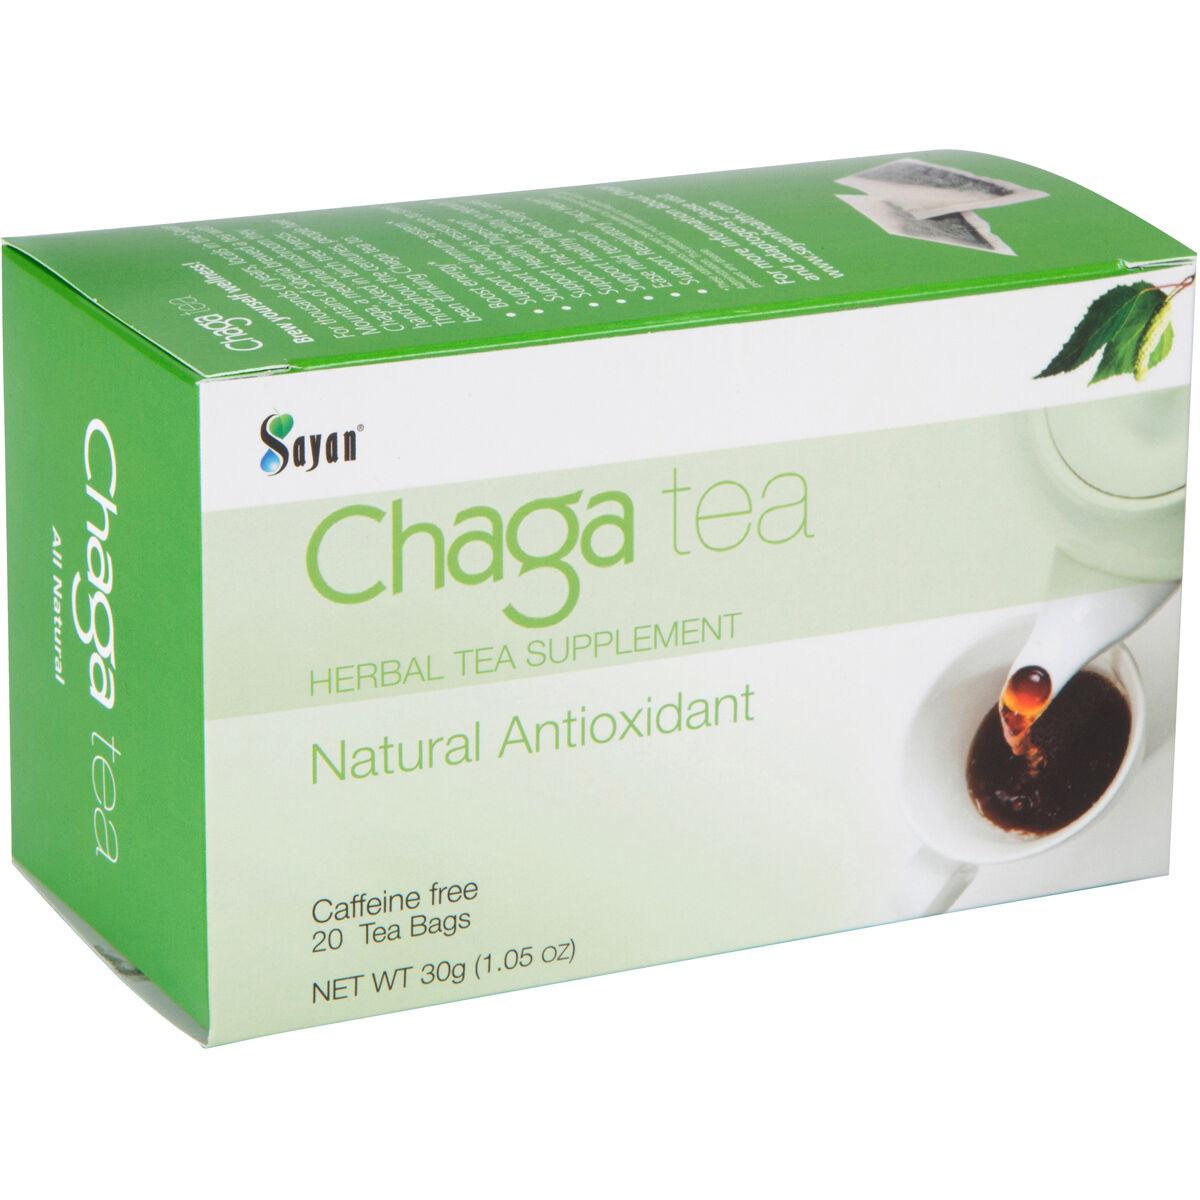 Siberian Chaga Mushroom Tea 20 bags, Wild Organic, Blend of